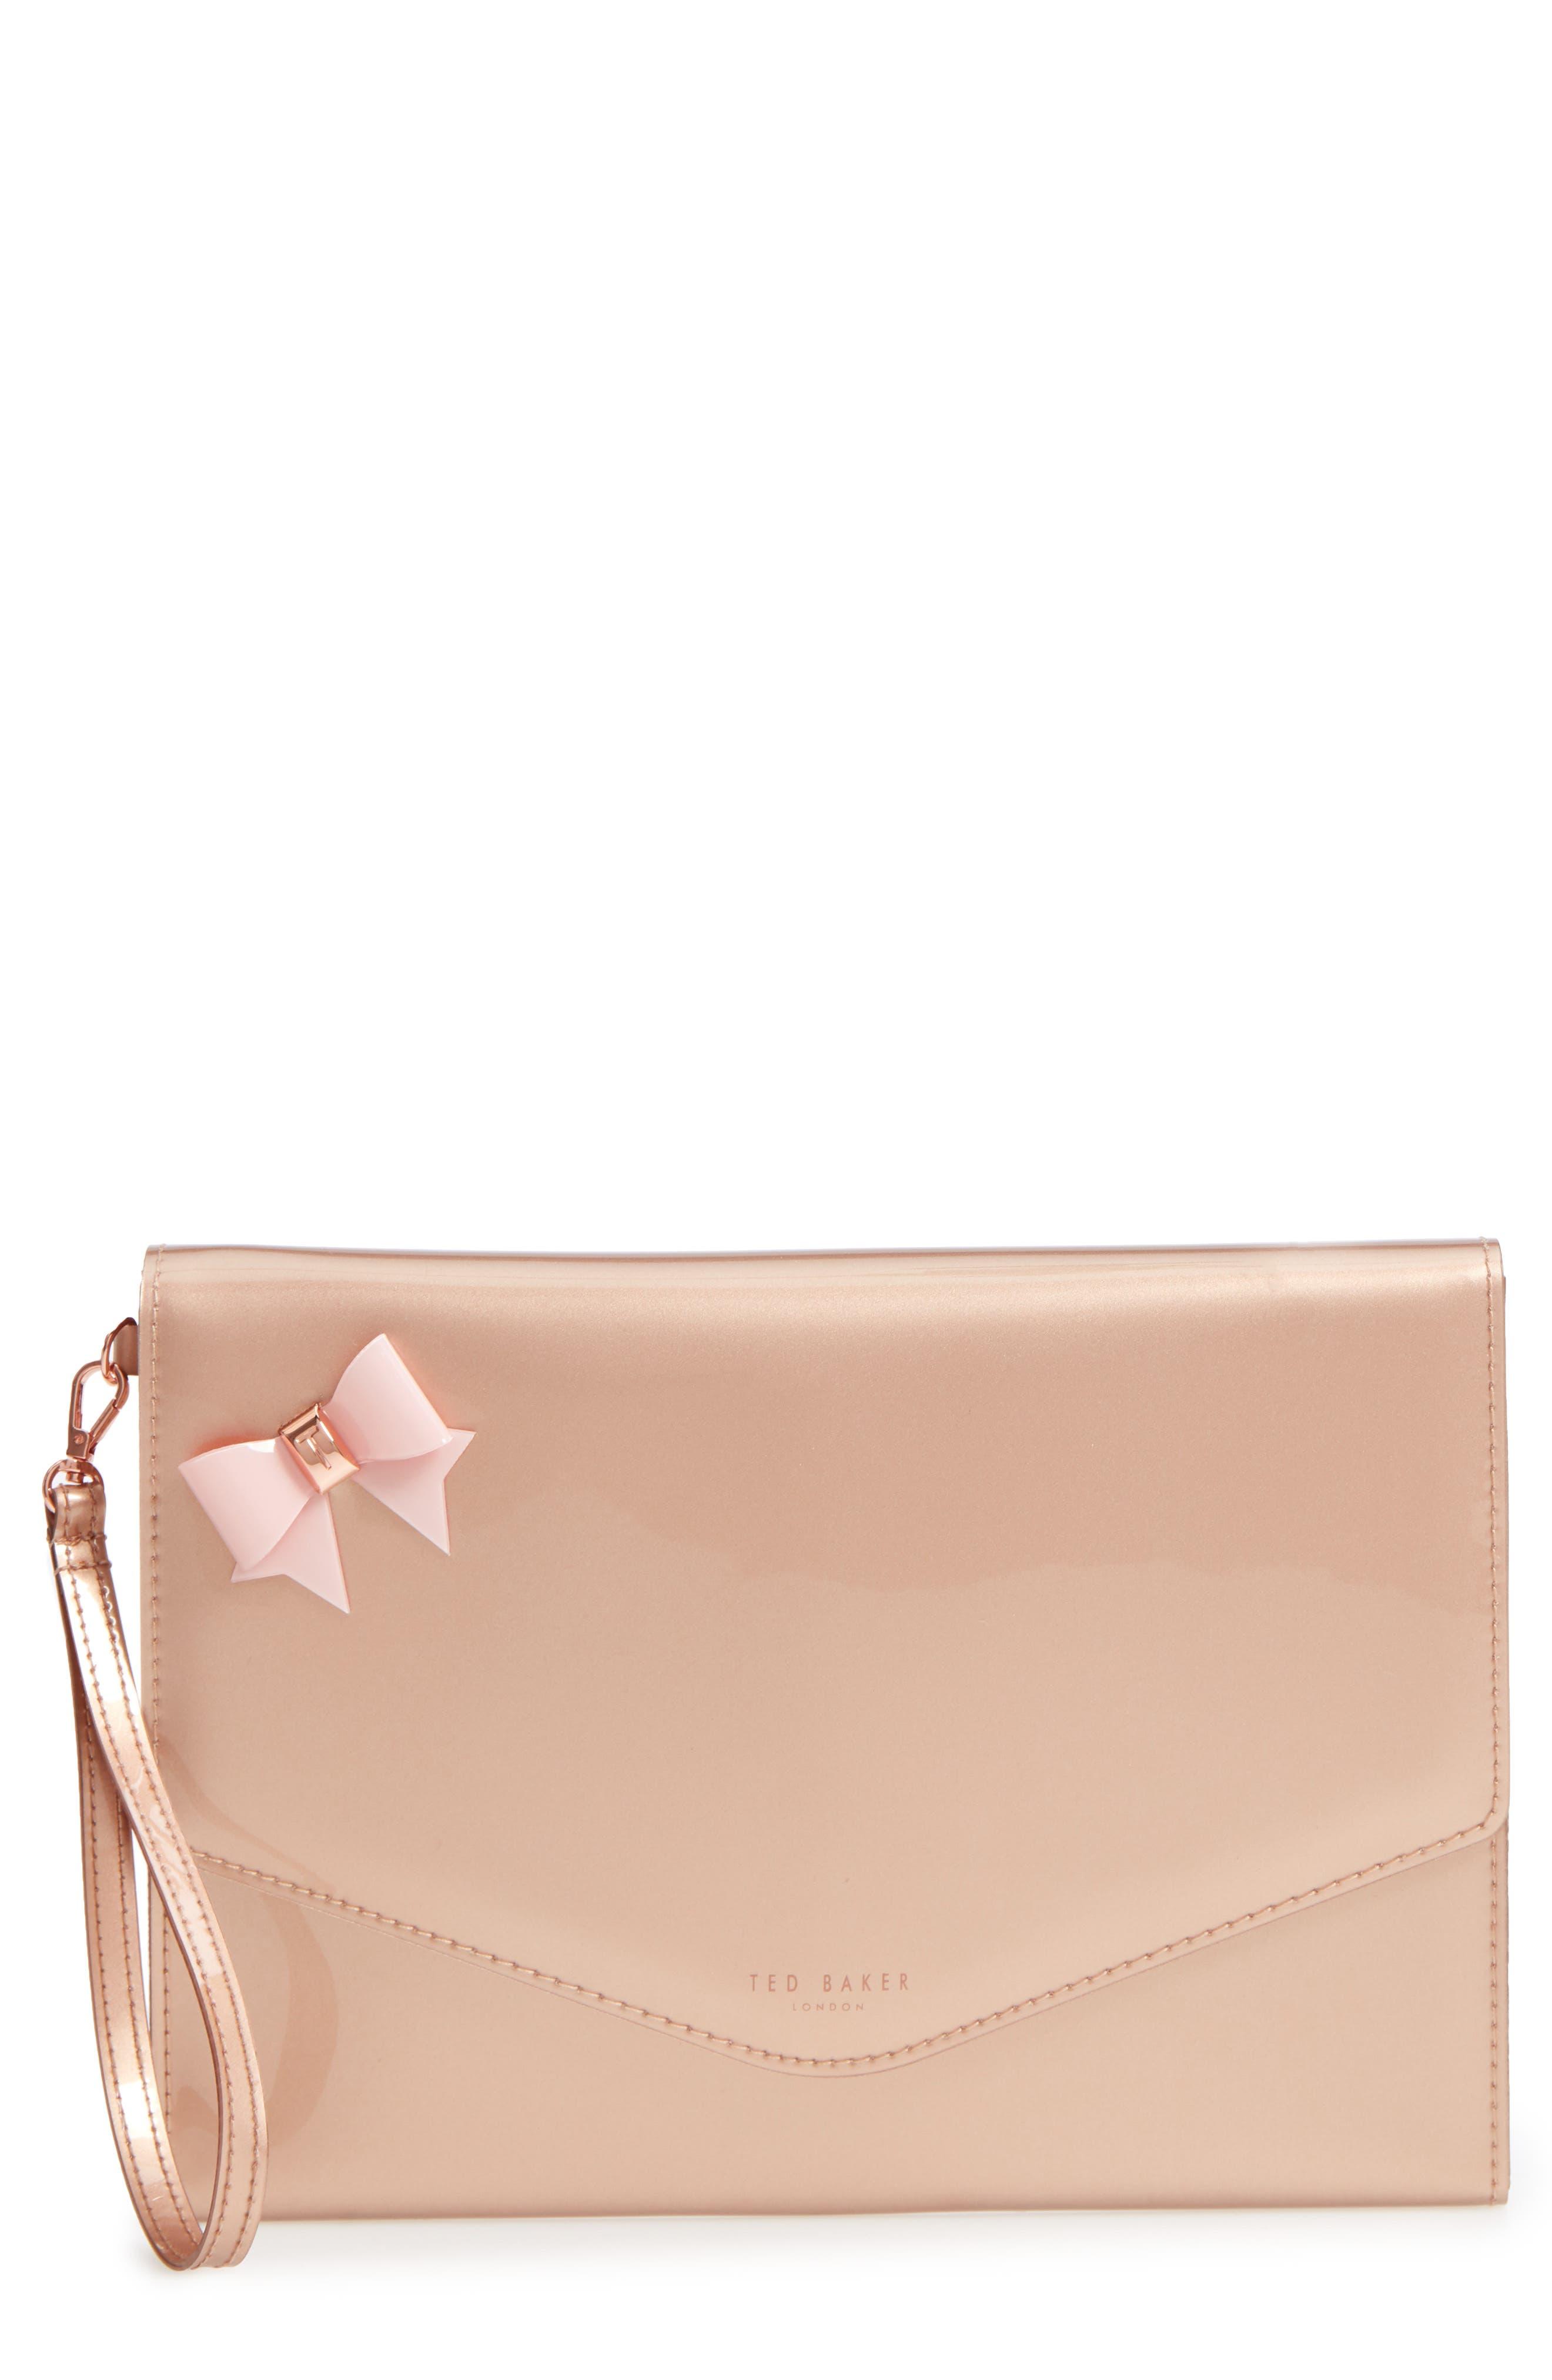 Bow Envelope Clutch,                         Main,                         color, Rose Gold